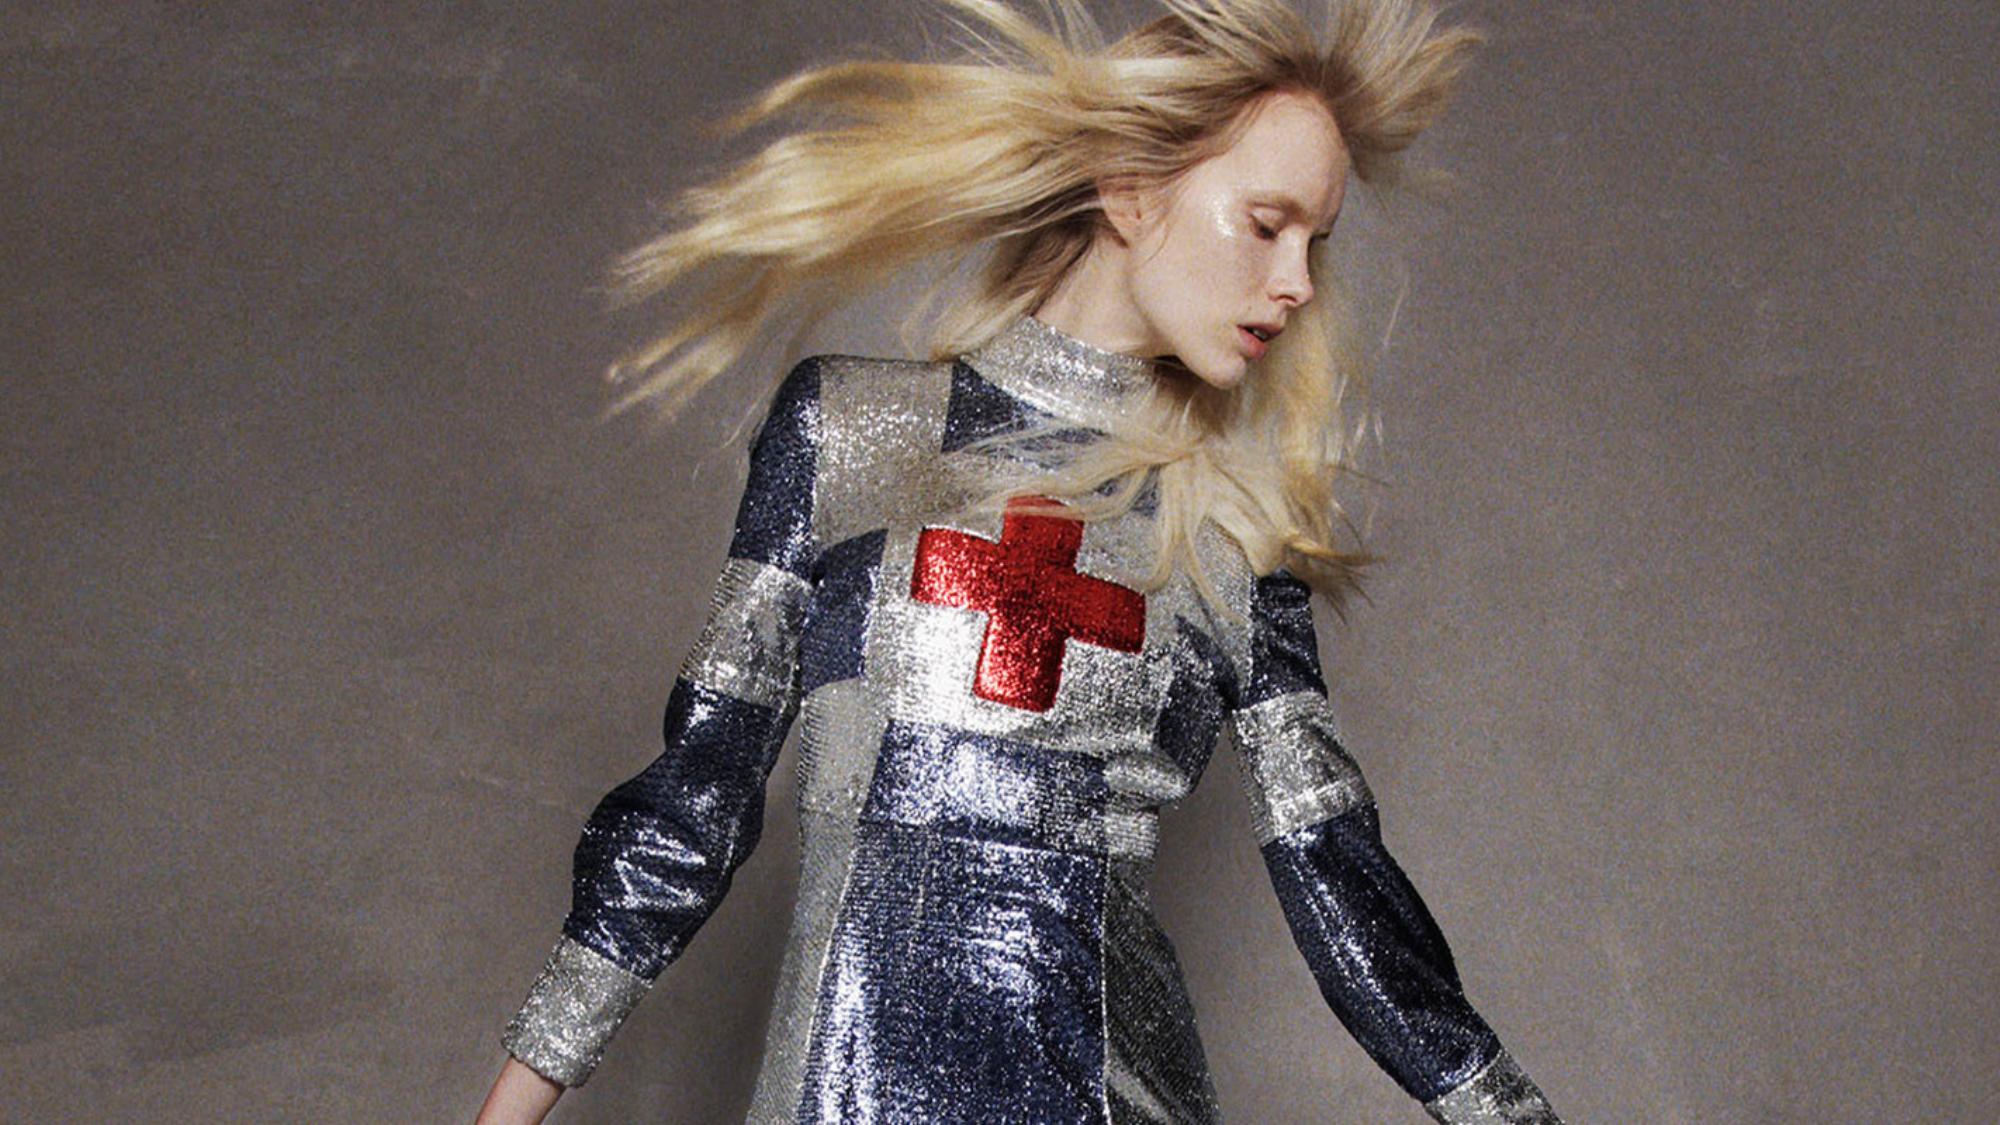 Aesthetica Magazine Restriction And Release Fashion Freedom Designers Five Established Vivienne Westwood J Js Lee Sadie Williams Roksanda Present Works Alongside The Next Generation Of Design Talent From Uk